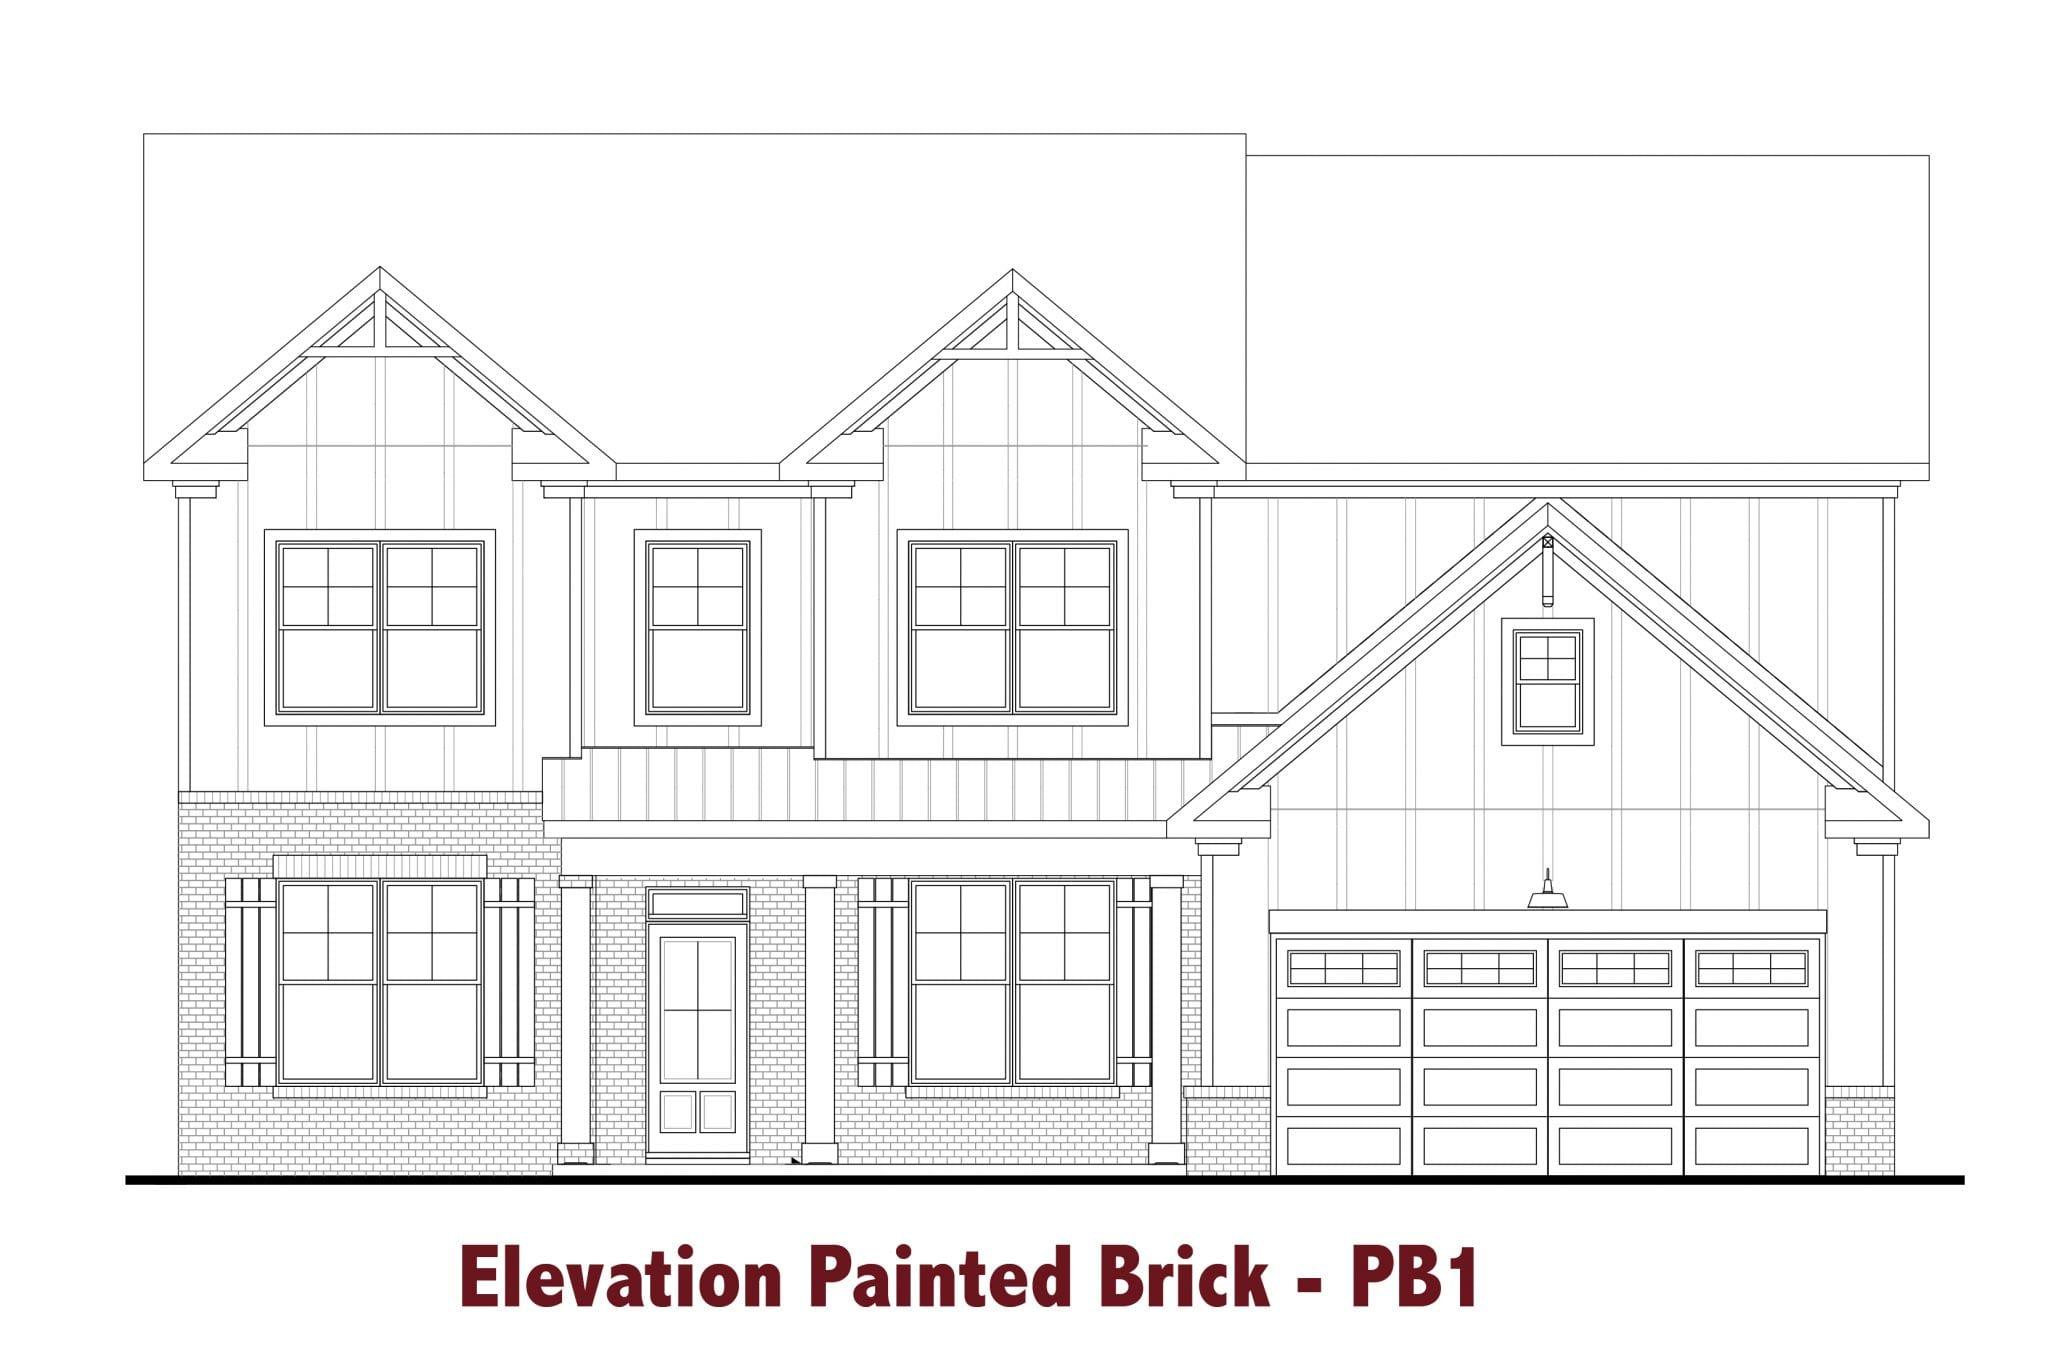 Brunswick-I elevations Image